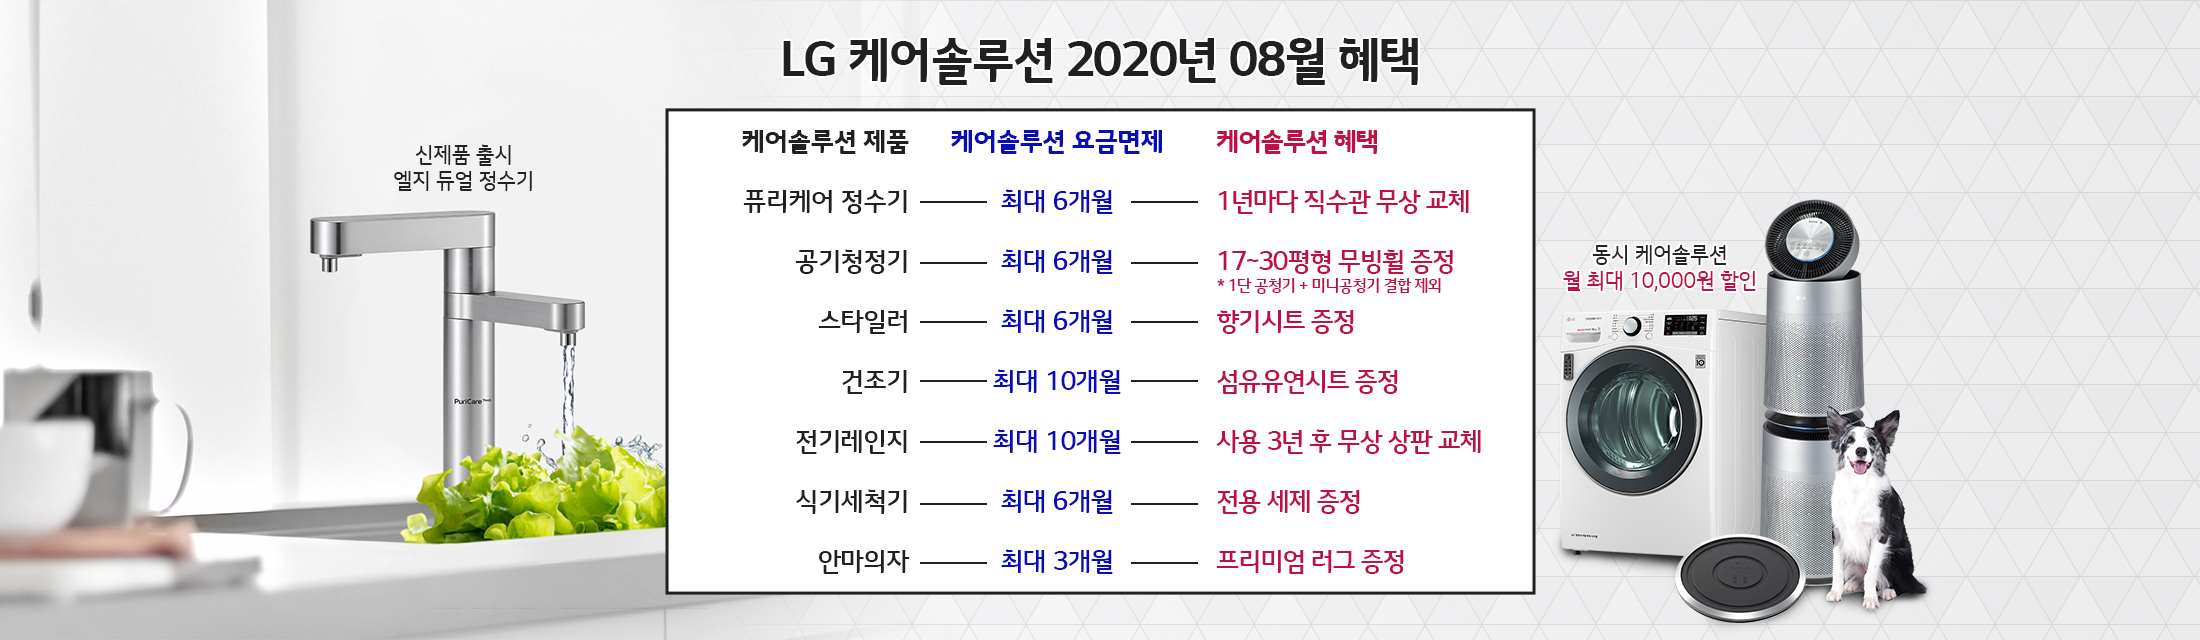 LG 케어솔루션 2020년 07월 혜택